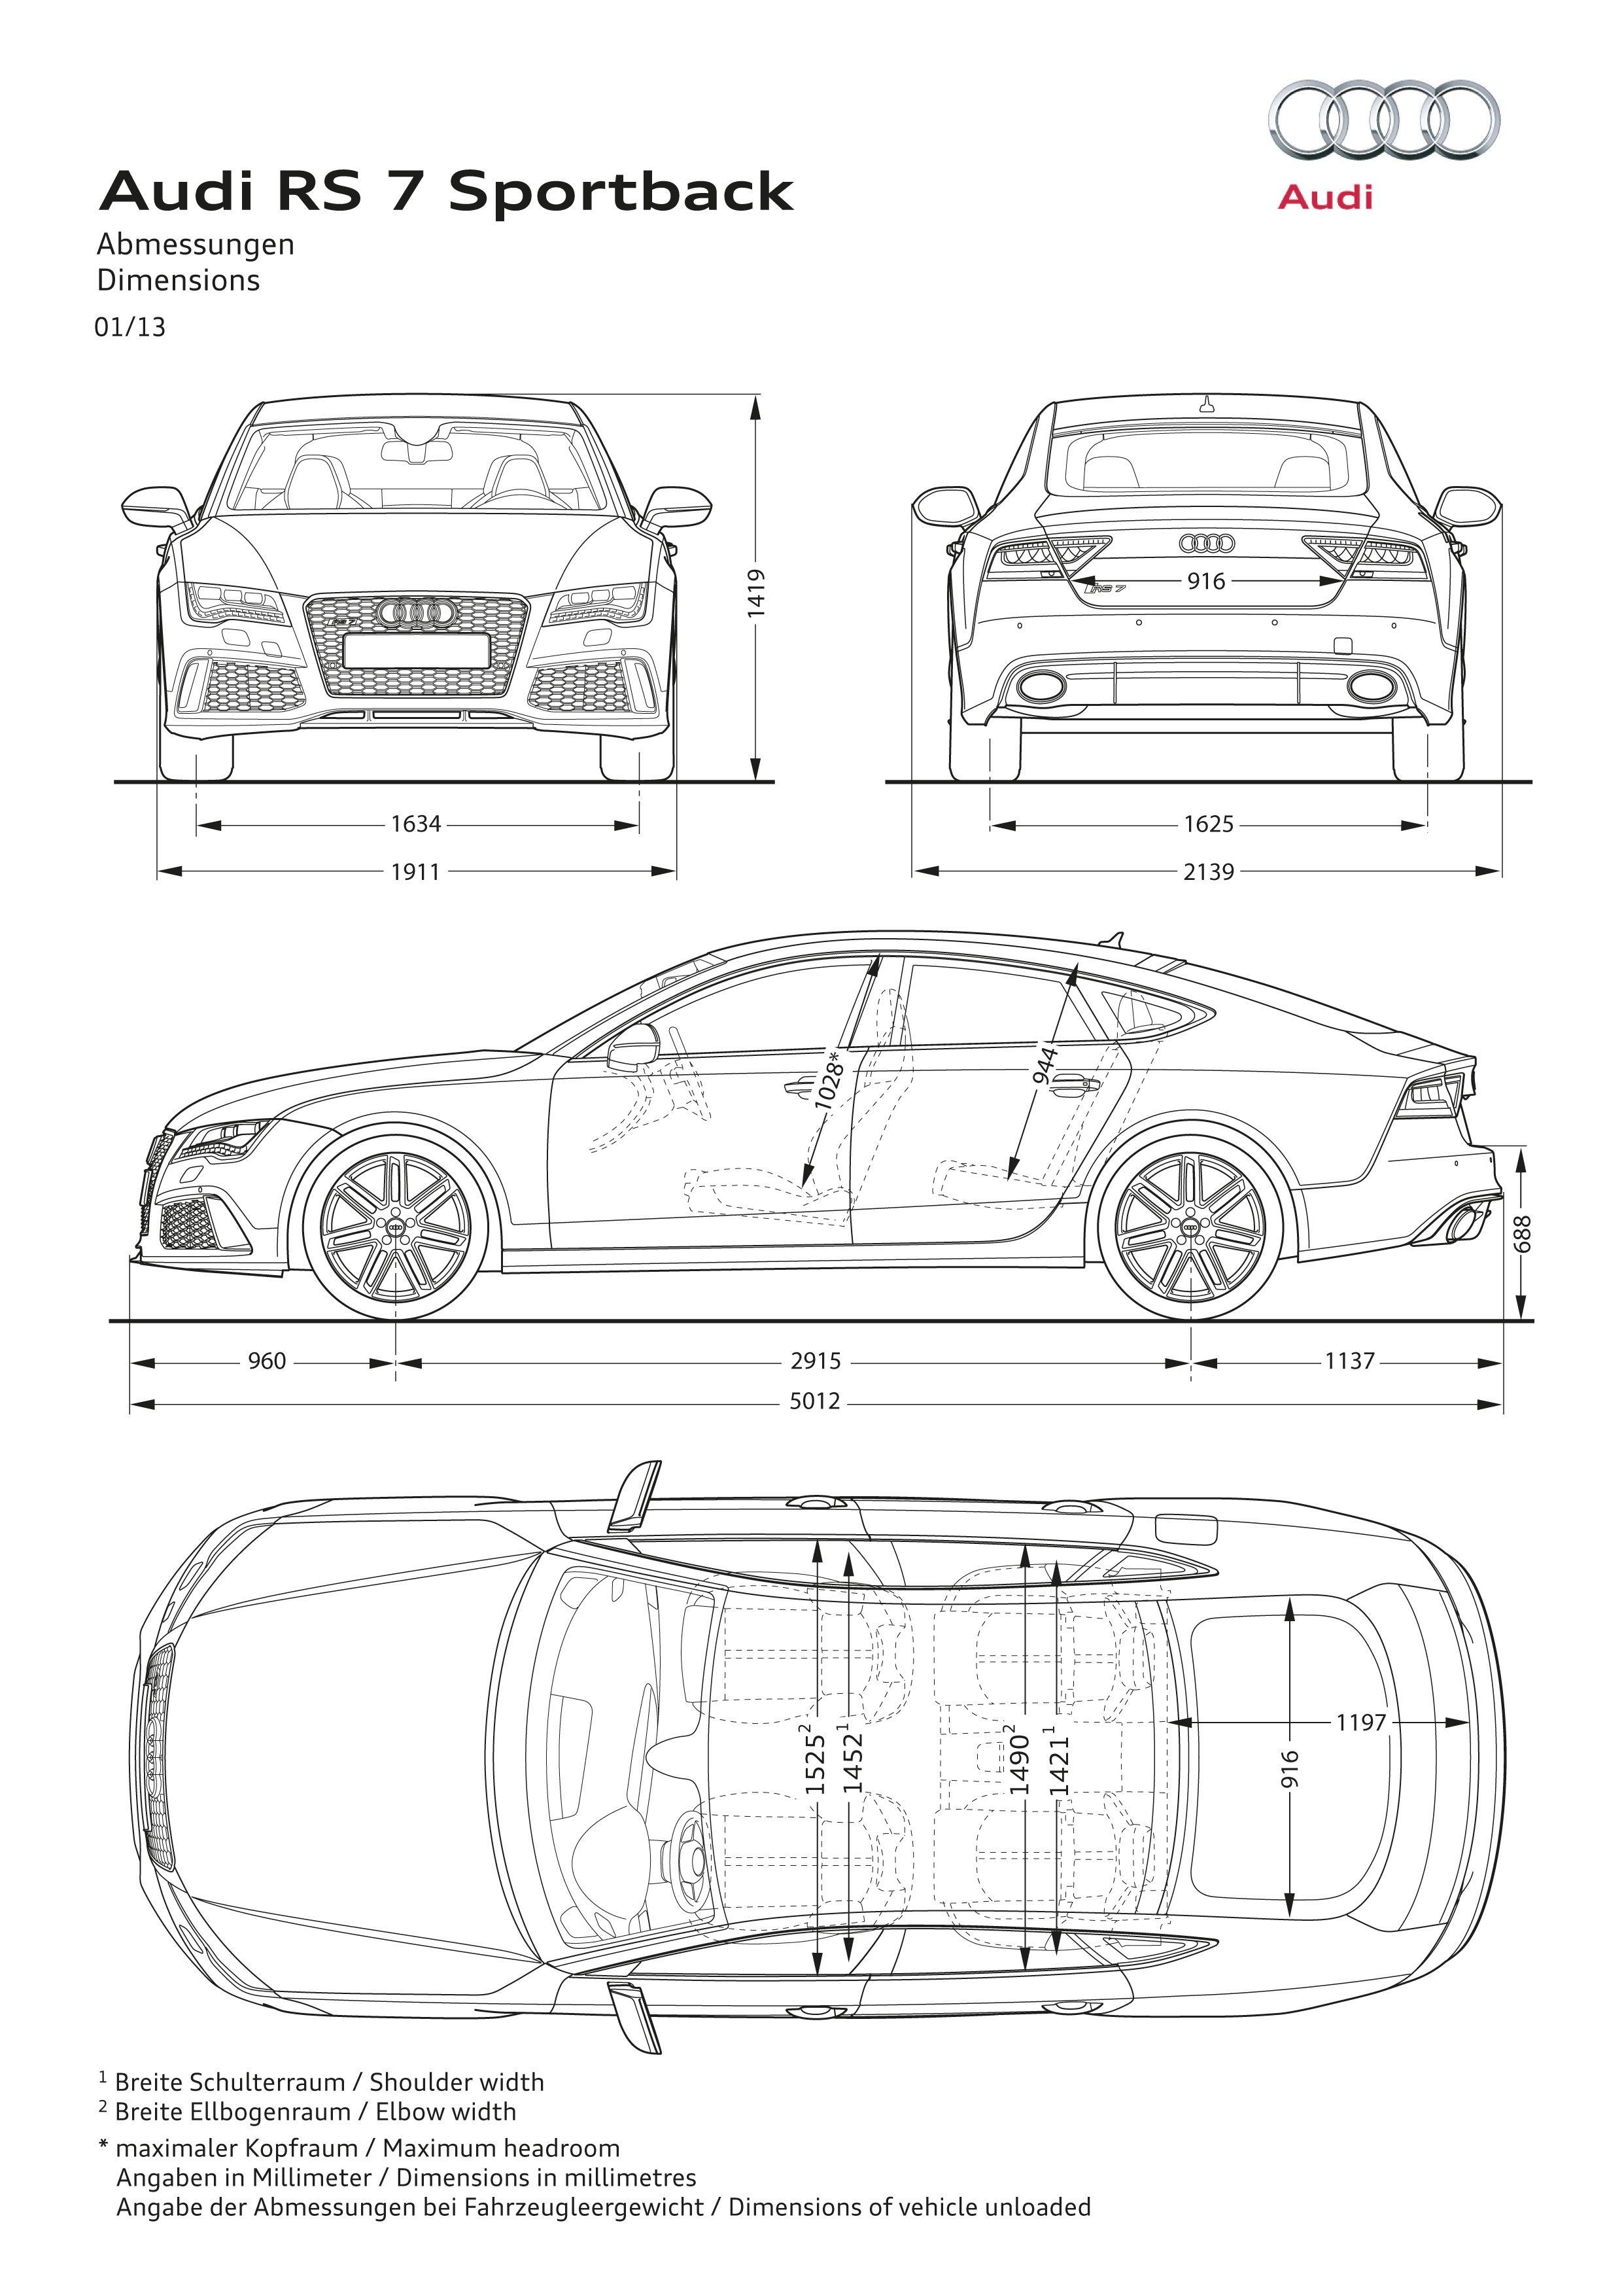 Pin By Fu Wen Woon On Car Audi A6 Avant Audi A3 Sportback Audi A3